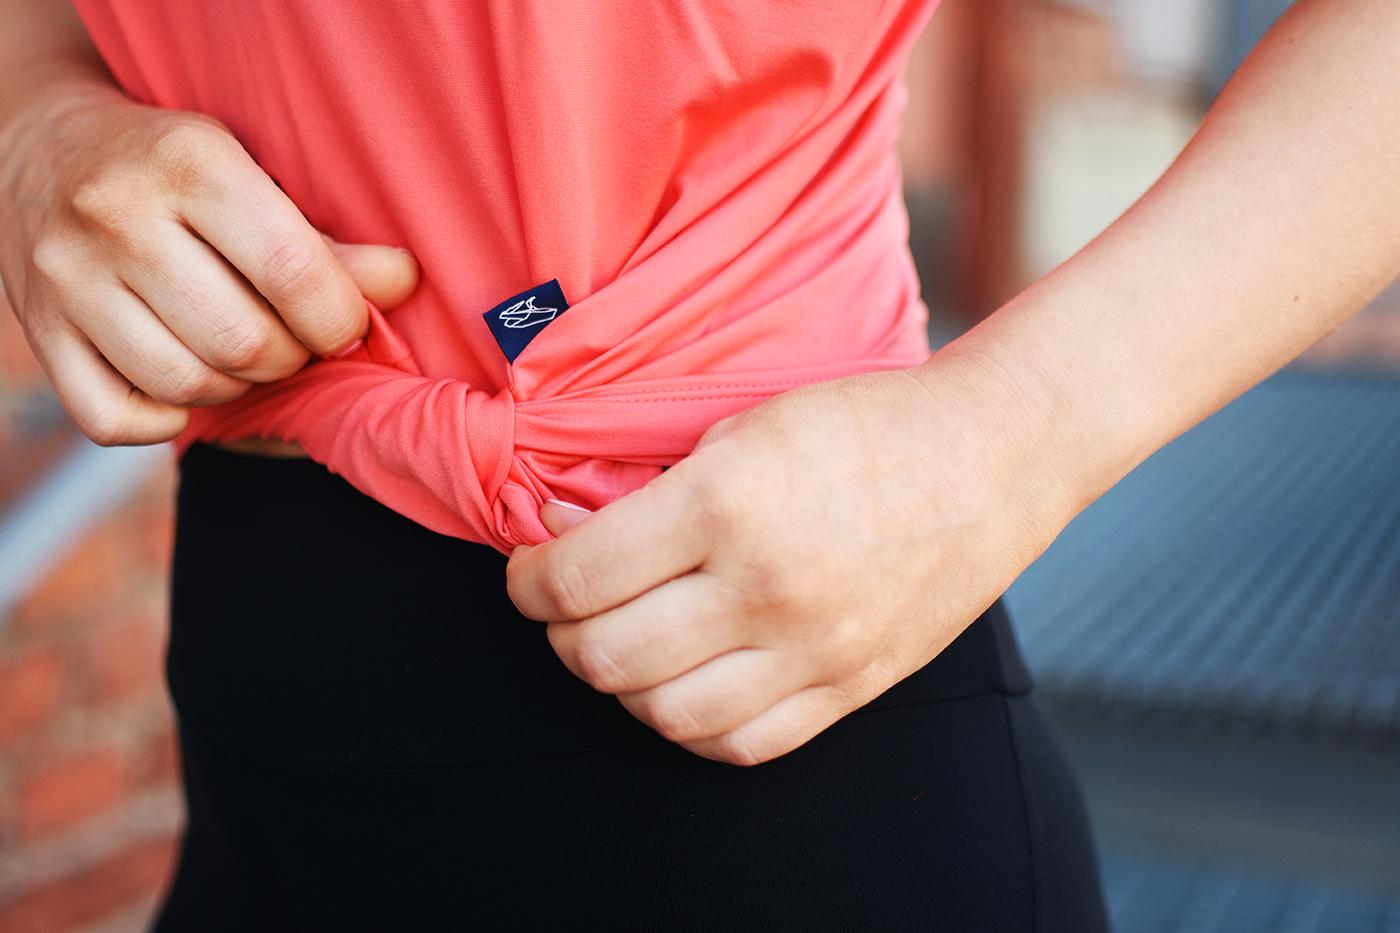 nepra-activewear-sundayblondie-2.jpg